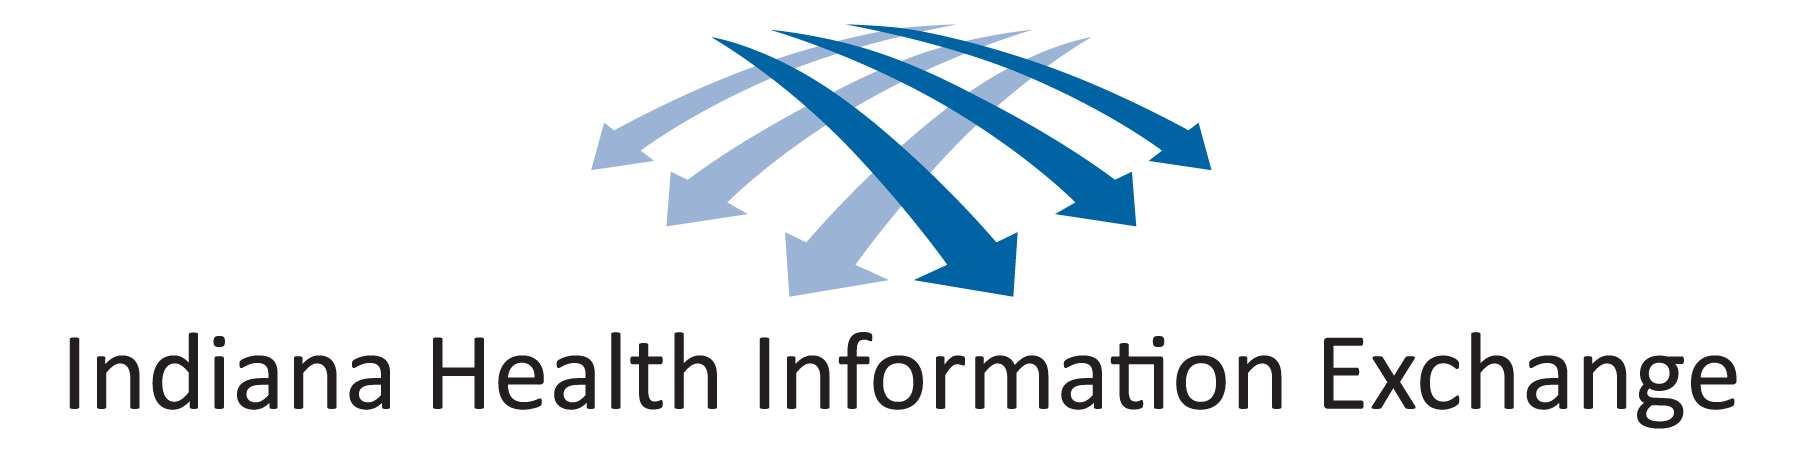 Indiana Health Information Exchange Company Logo